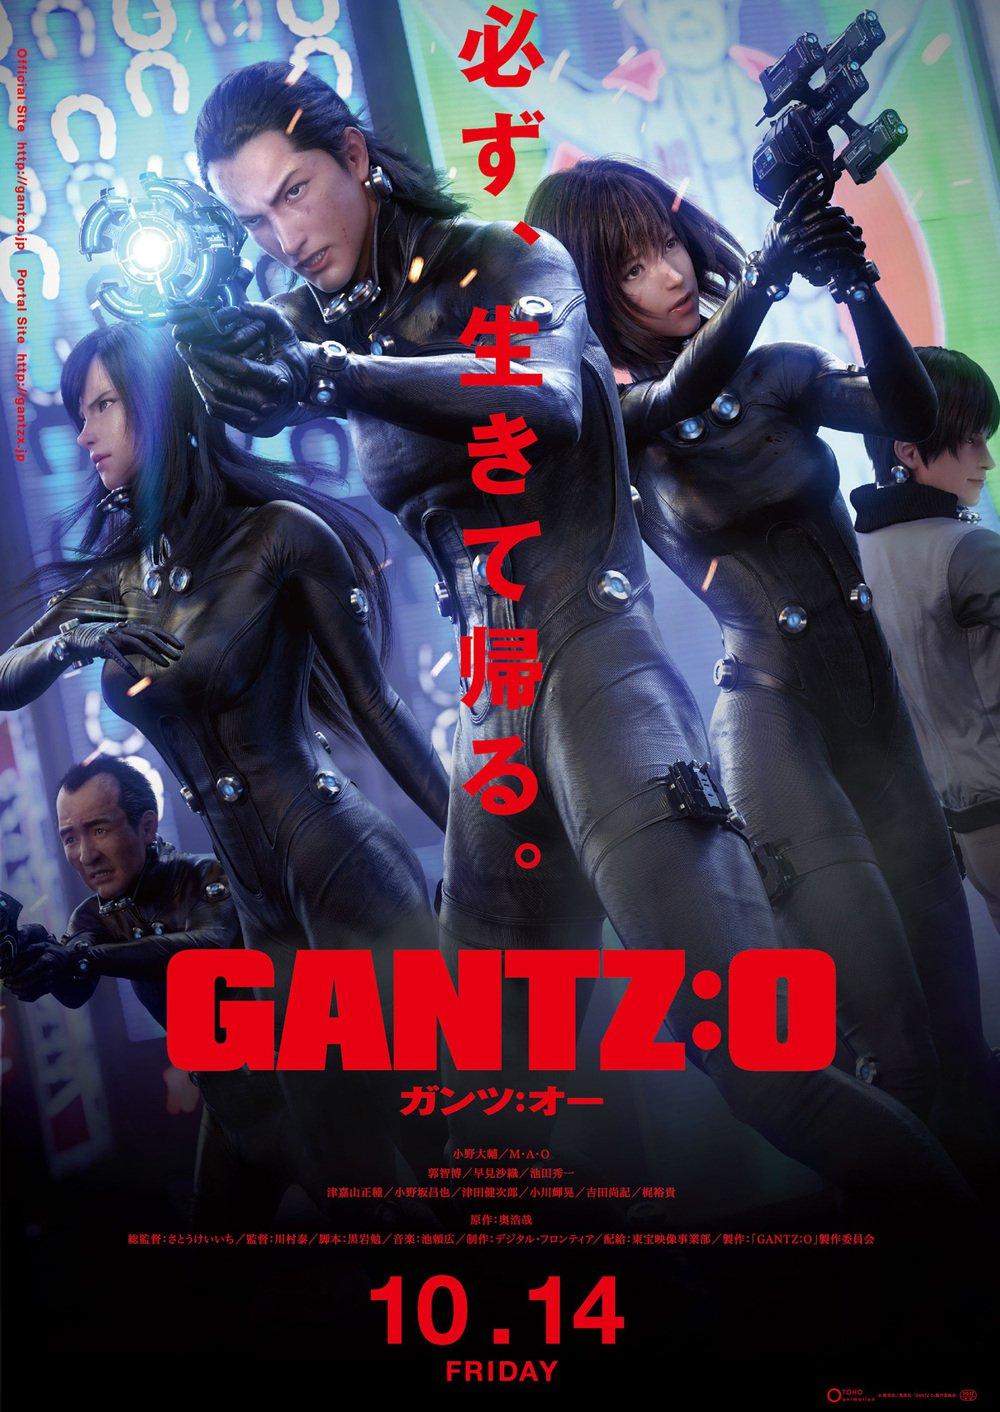 affiche du film Gantz: O